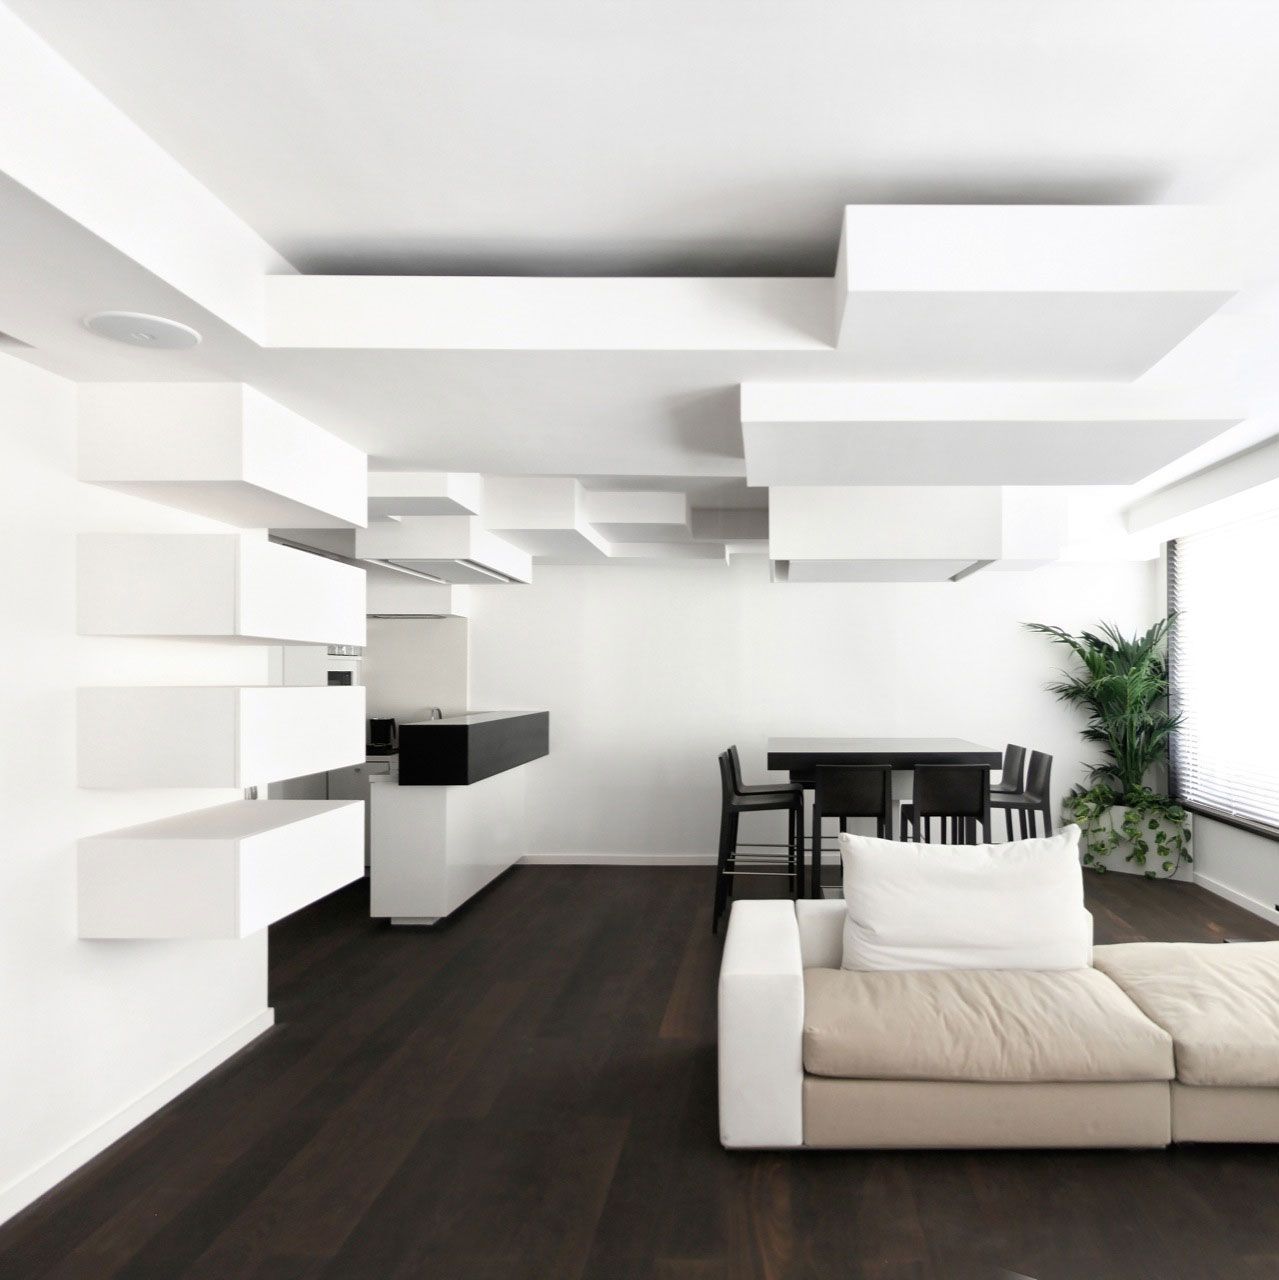 Monochrome Duplex Apartment Remodeling In Paris By Pascal